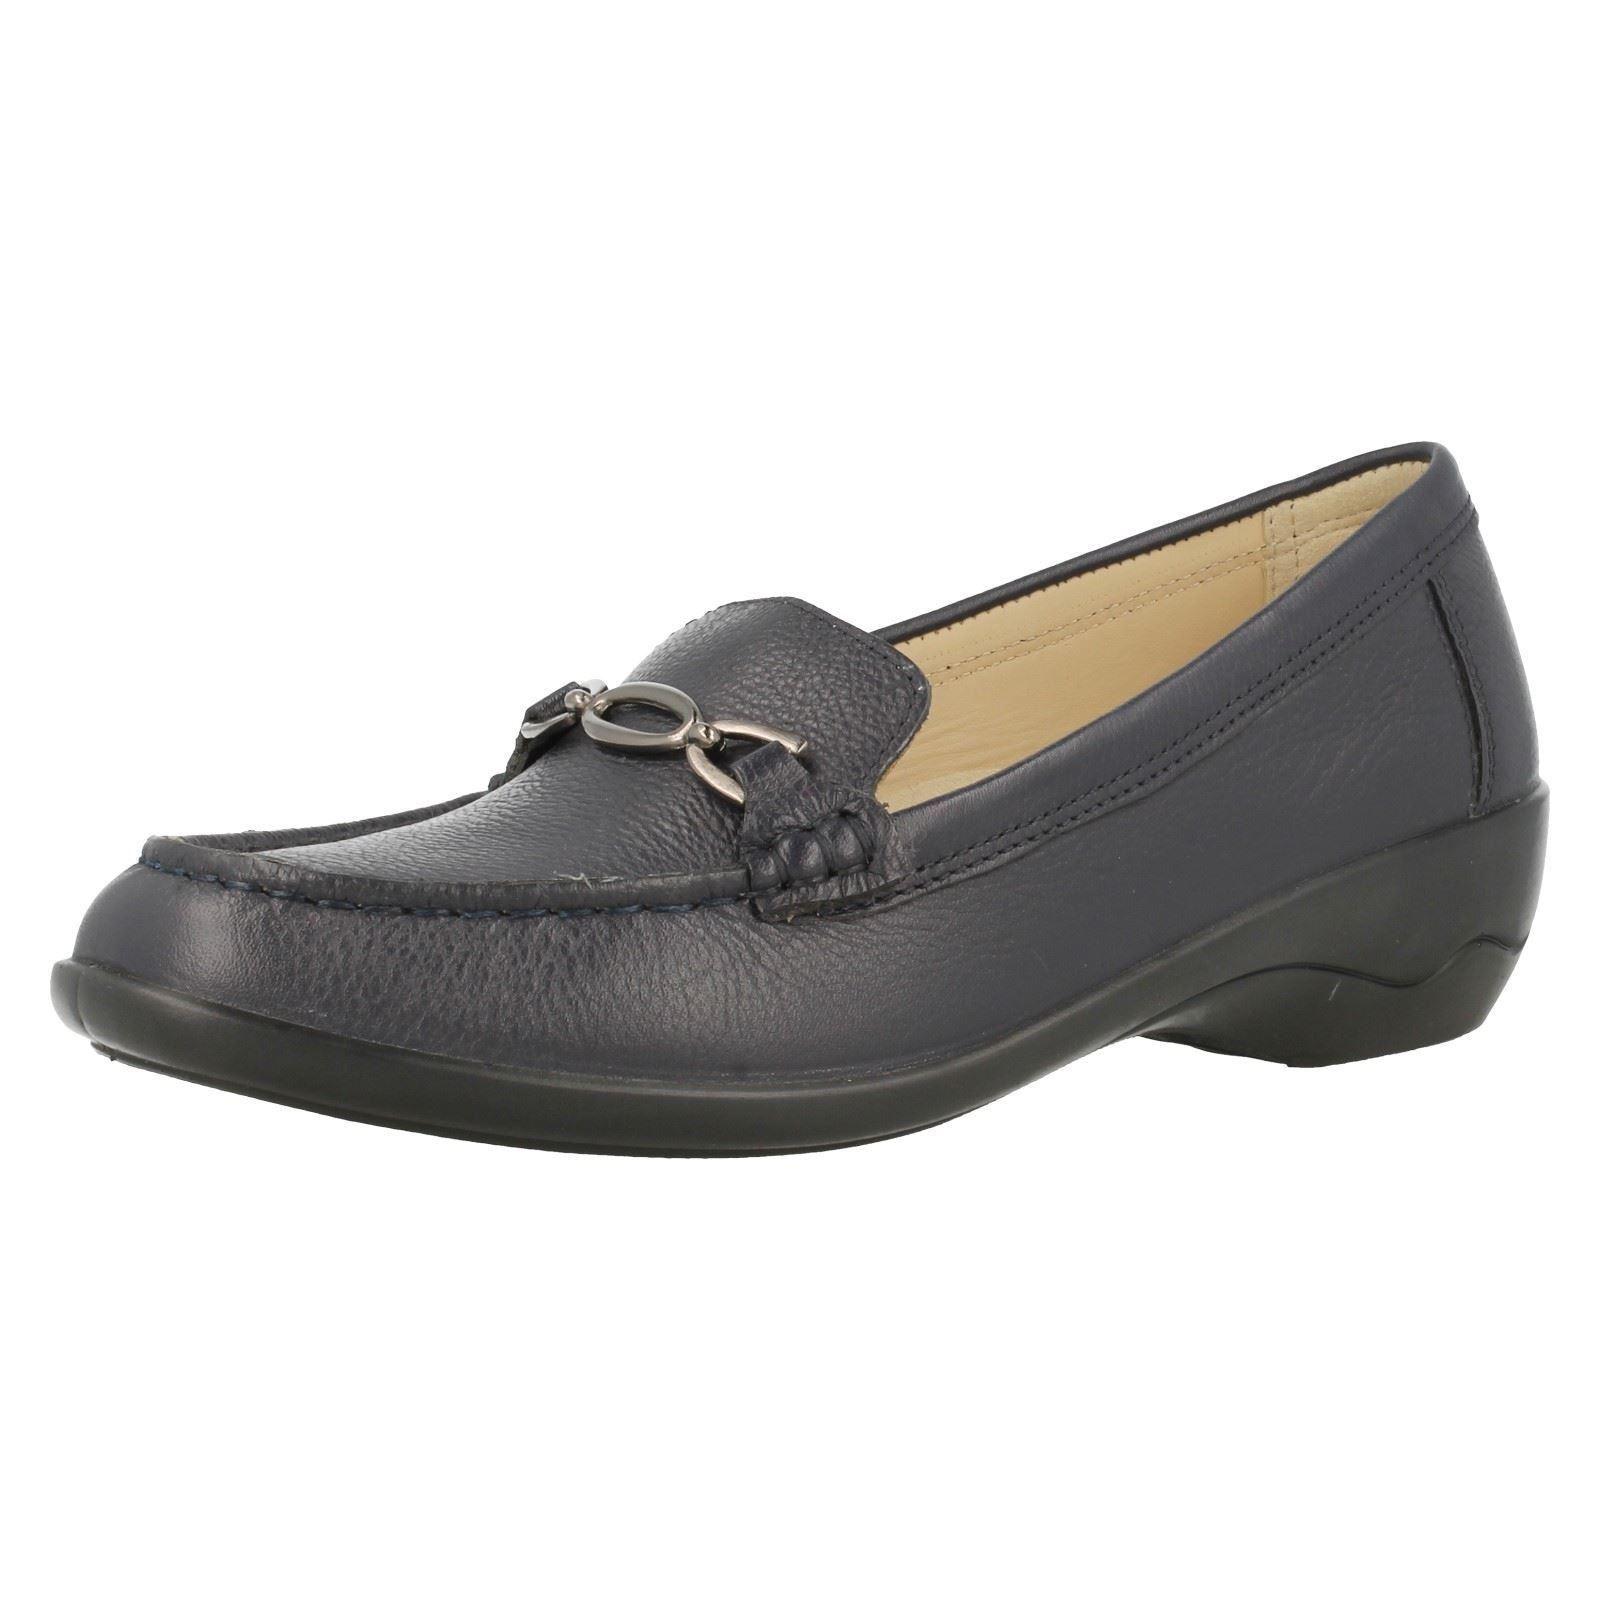 Ladies Padders Ellen Navy Leather  Wide EE EE EE Fitting Slip On Moccasin shoes Size 3 c9b014